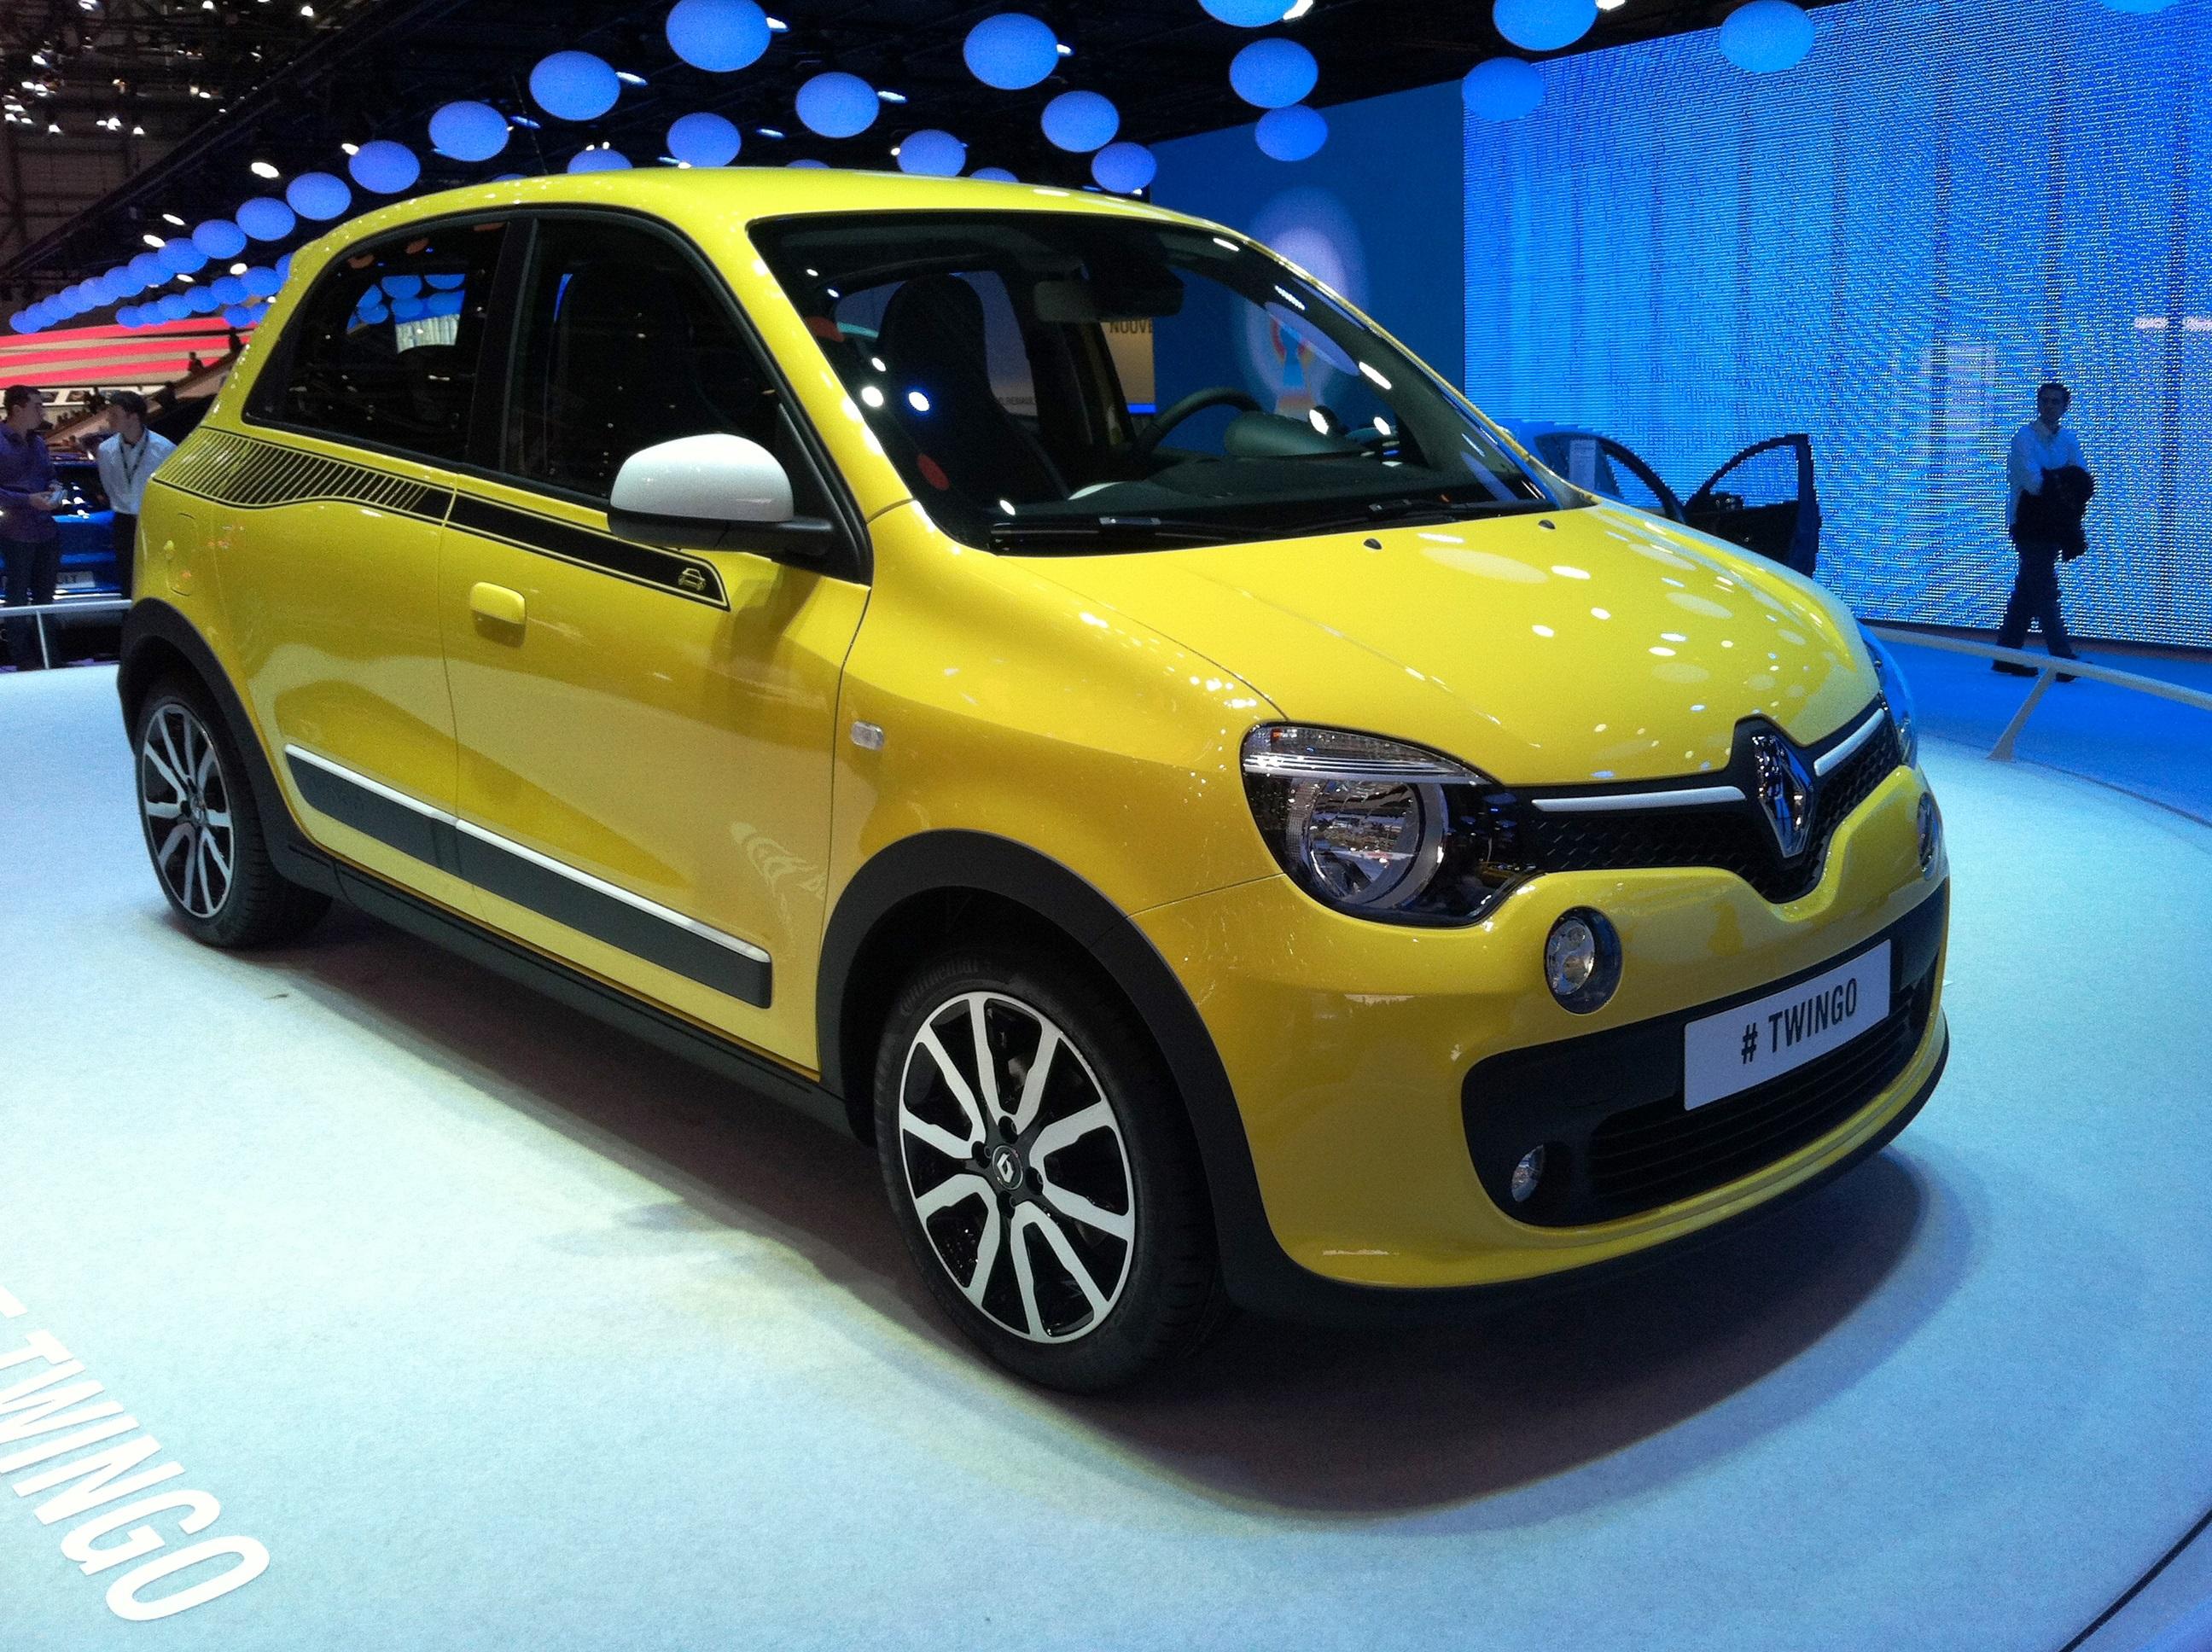 Genuine Renault Twingo 1.2 Turbo Service kit